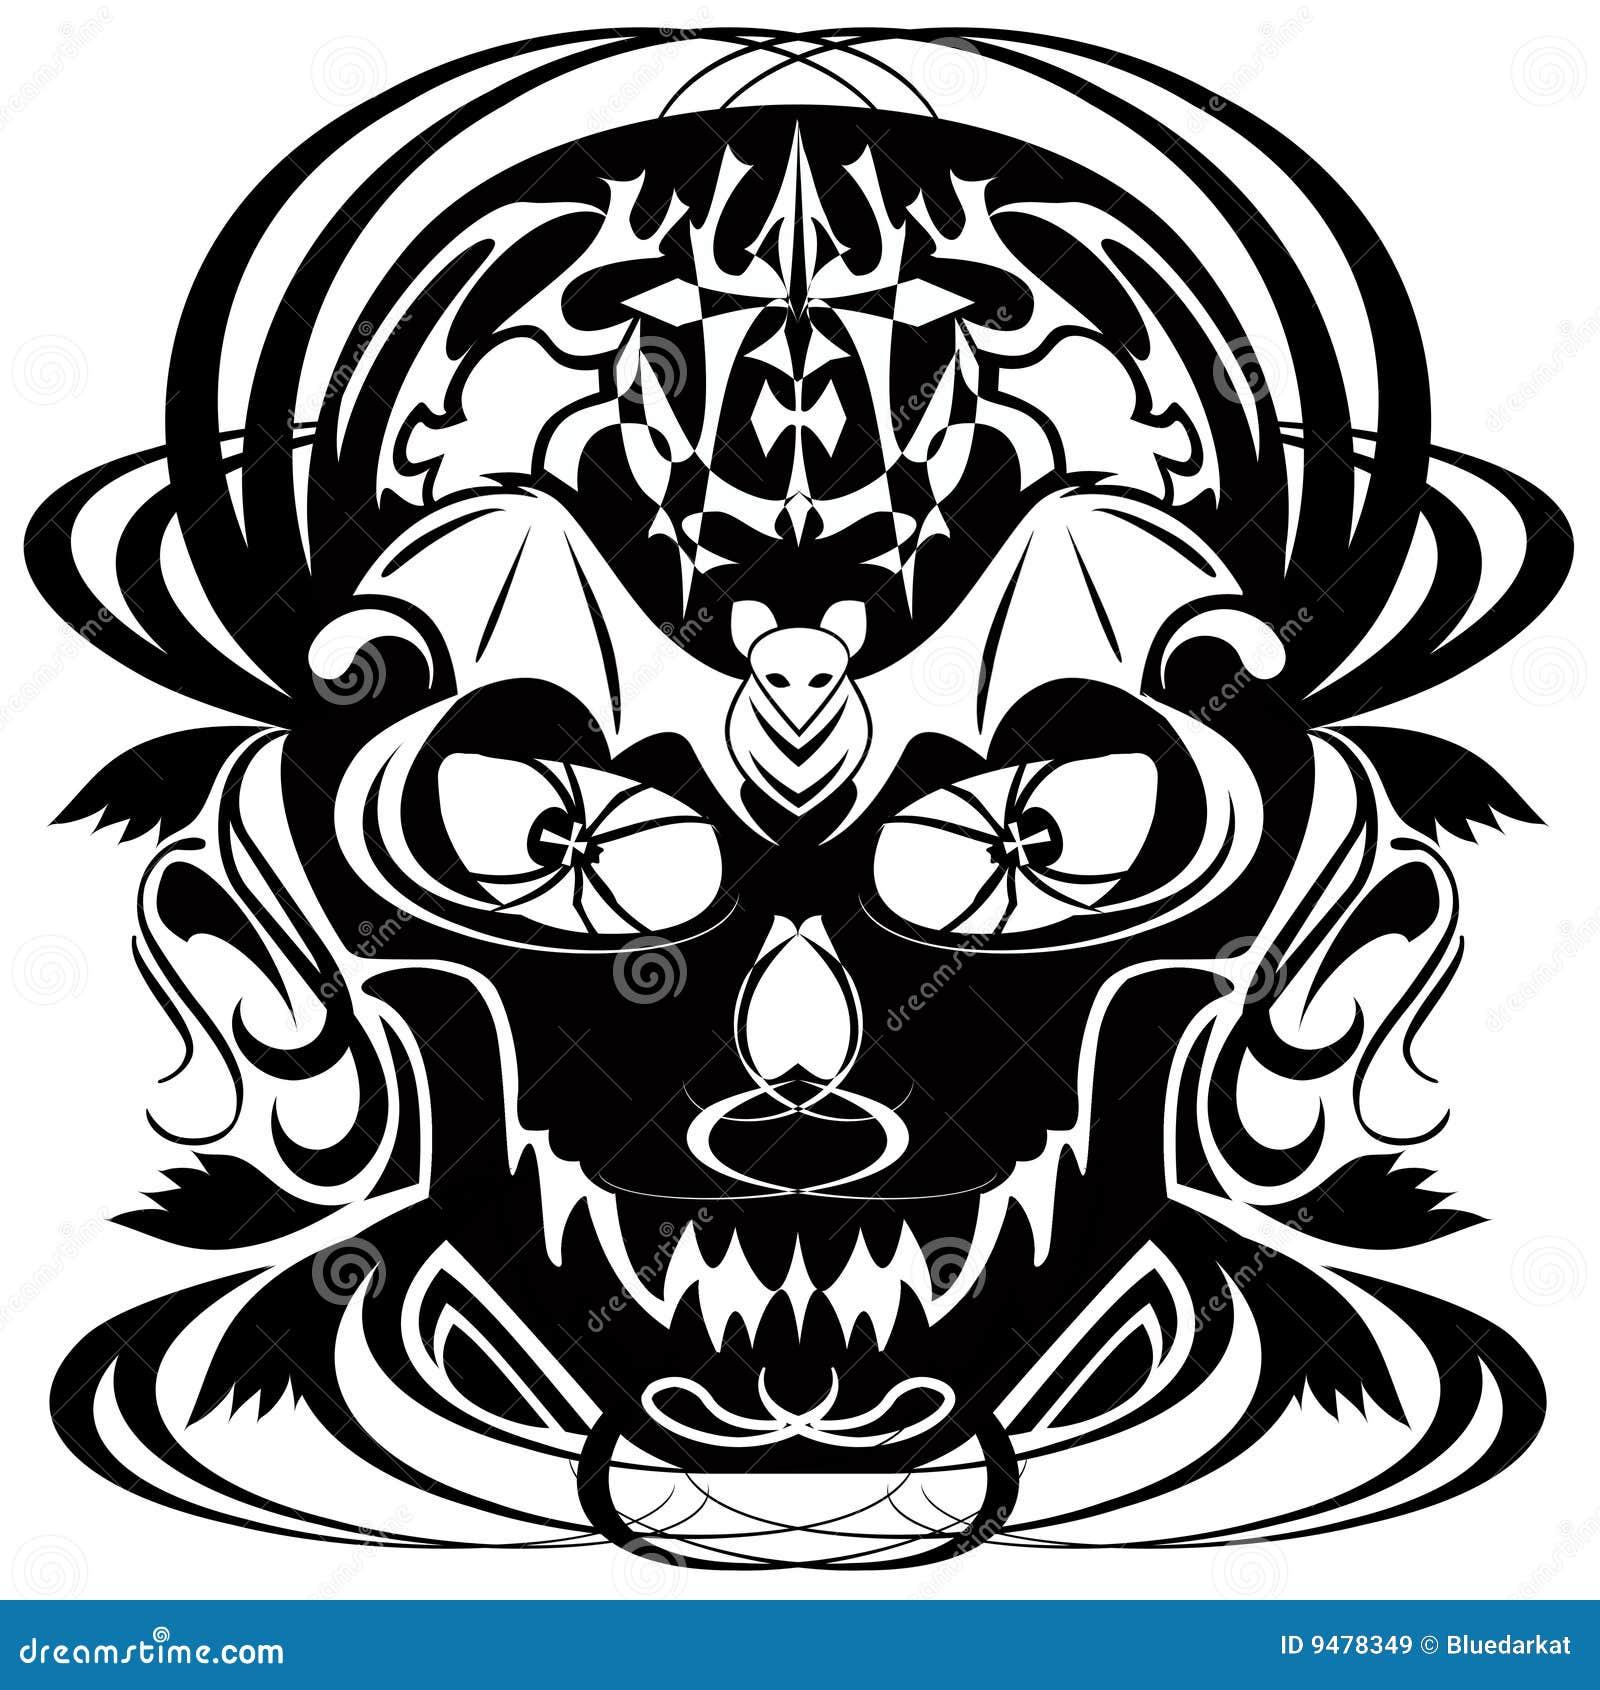 halloween skull tatoo royalty free stock images - Halloween Skull